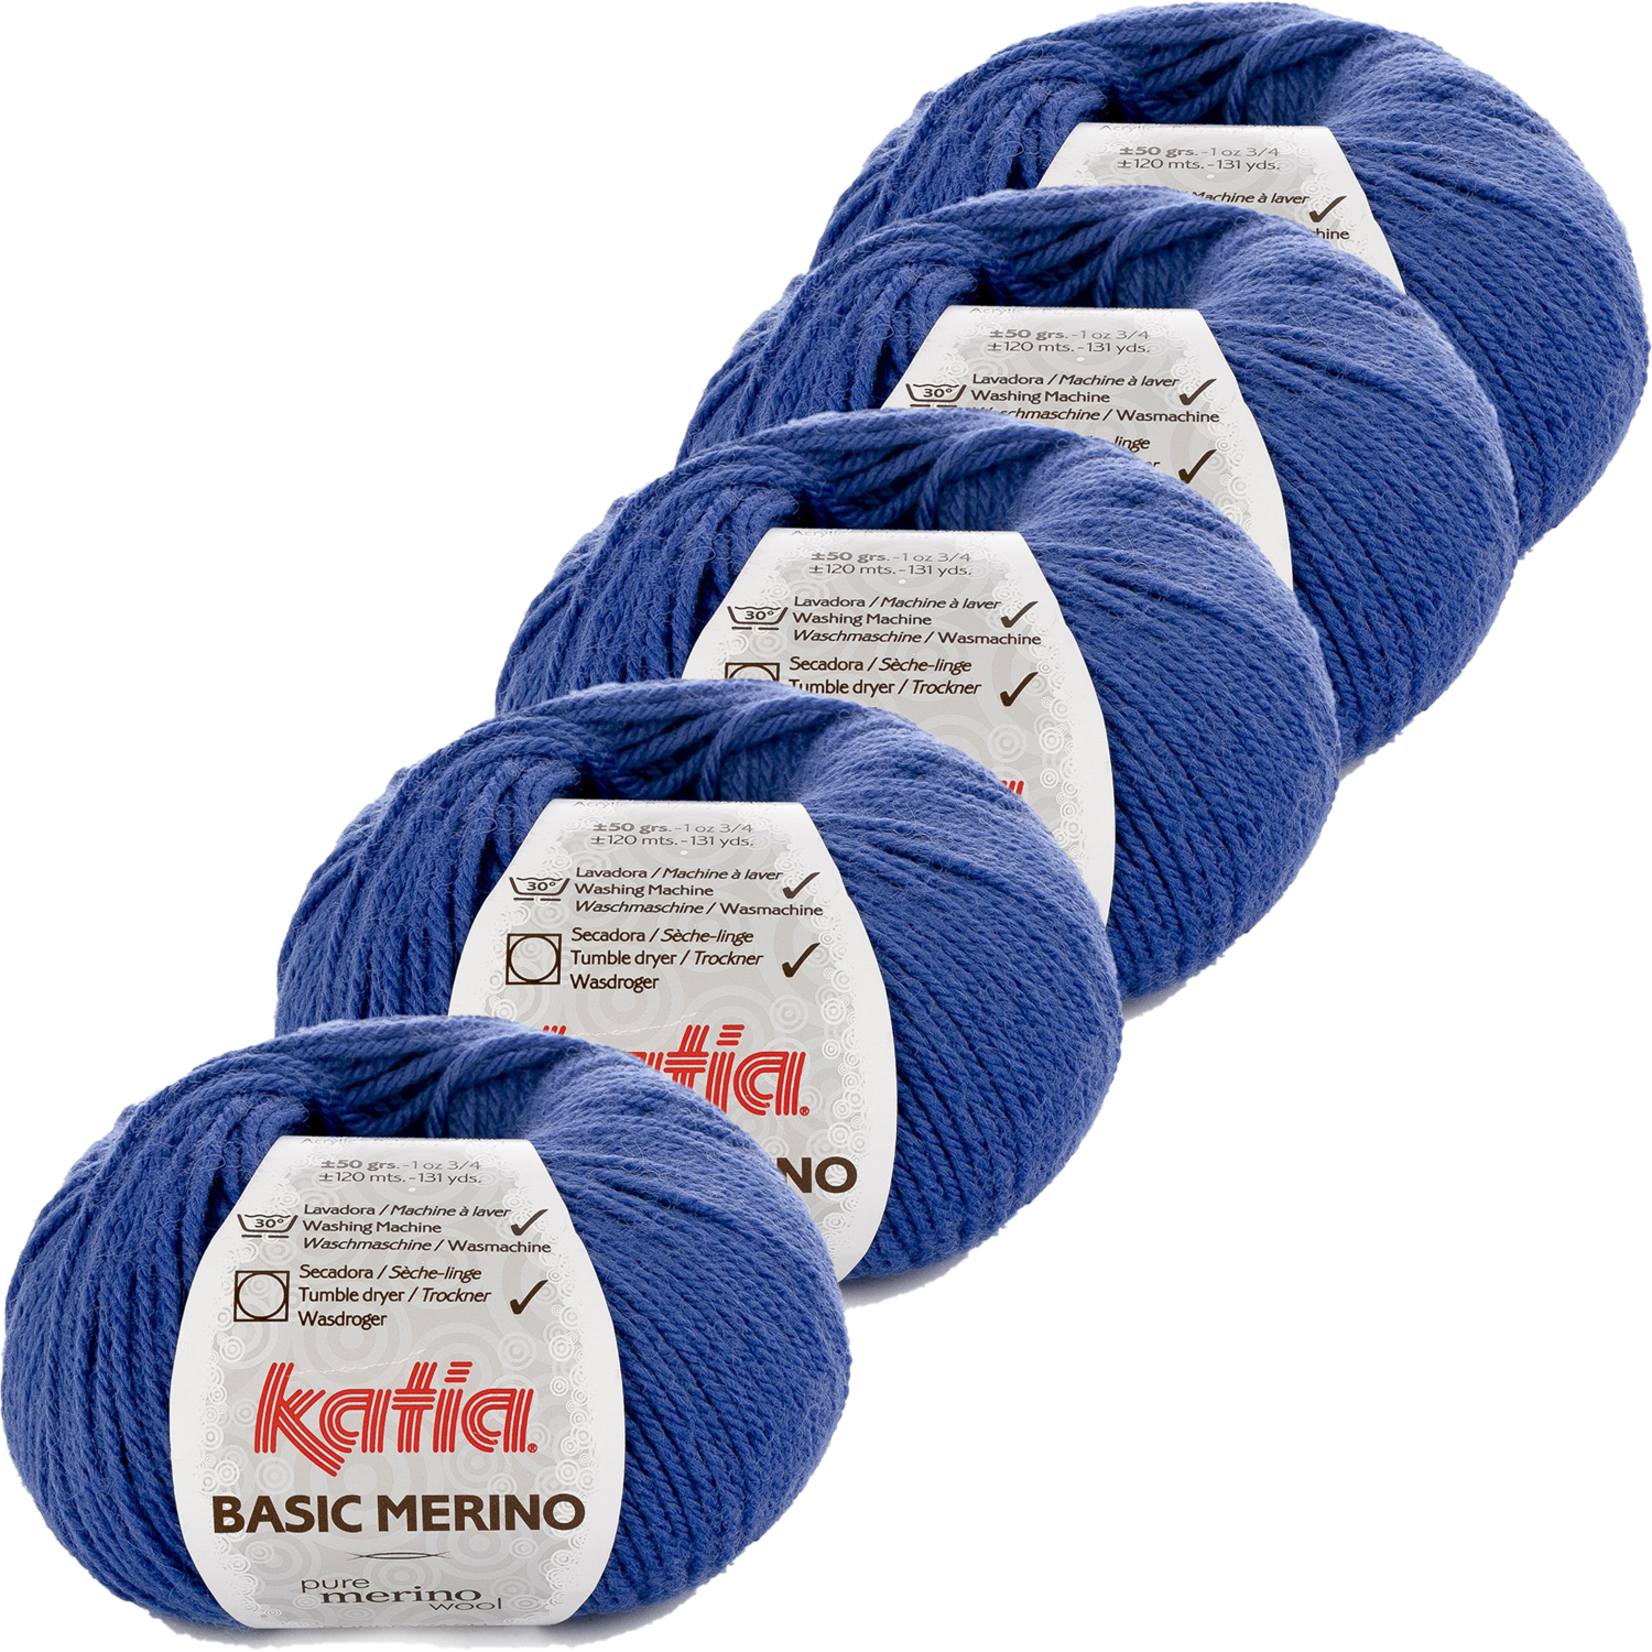 Katia Basic Merino - kleur 45_Blauw - bundel 5 bollen 50 gr.  van 120 m.